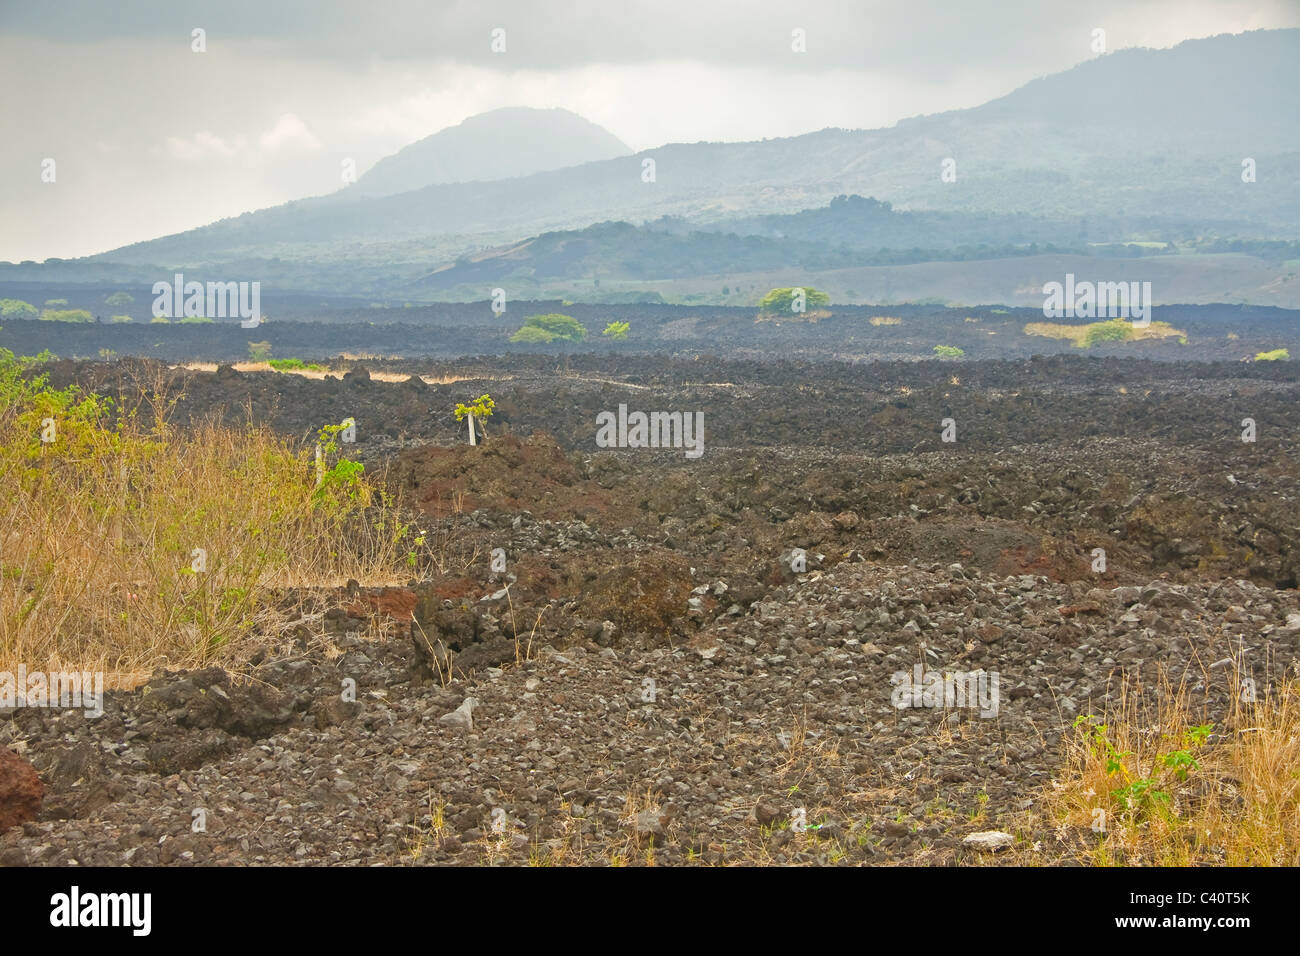 Quetzaltepec volcanic lava field with El Picacho Peak in background near San Salvador - Stock Image